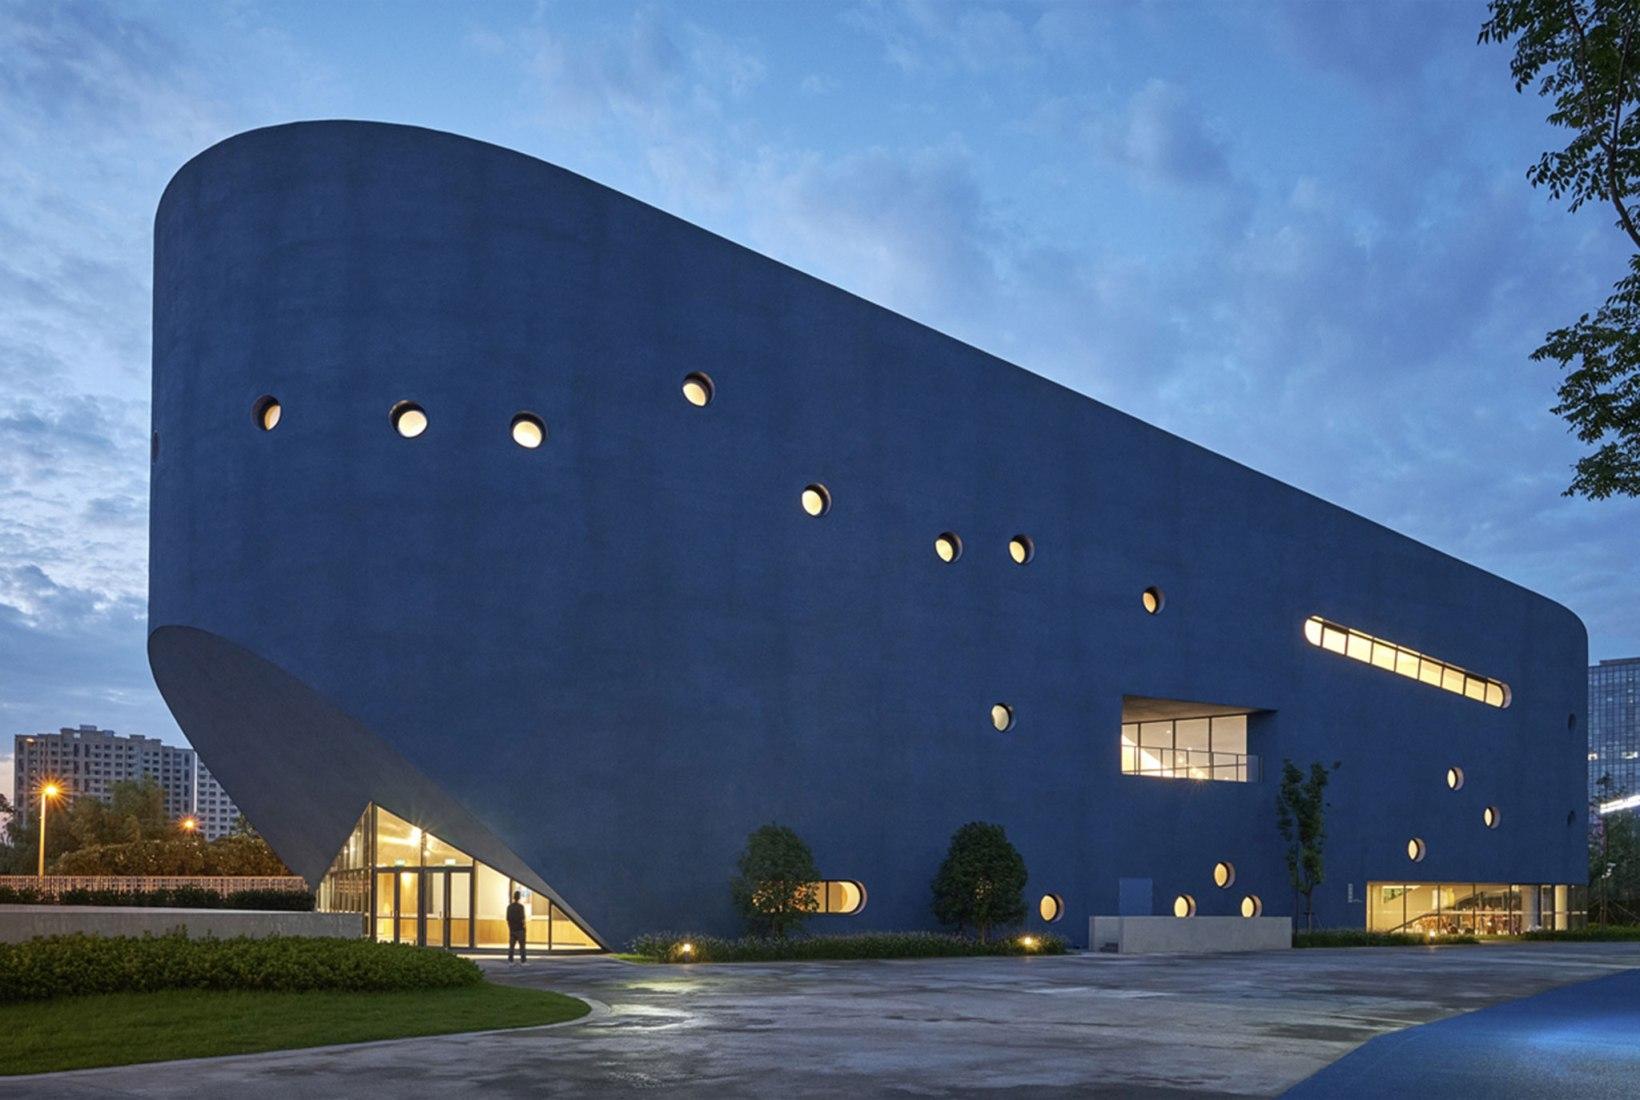 Pinghe Bibliotheater por OPEN Architecture. Fotografía por Jonathan Leijonhufvud